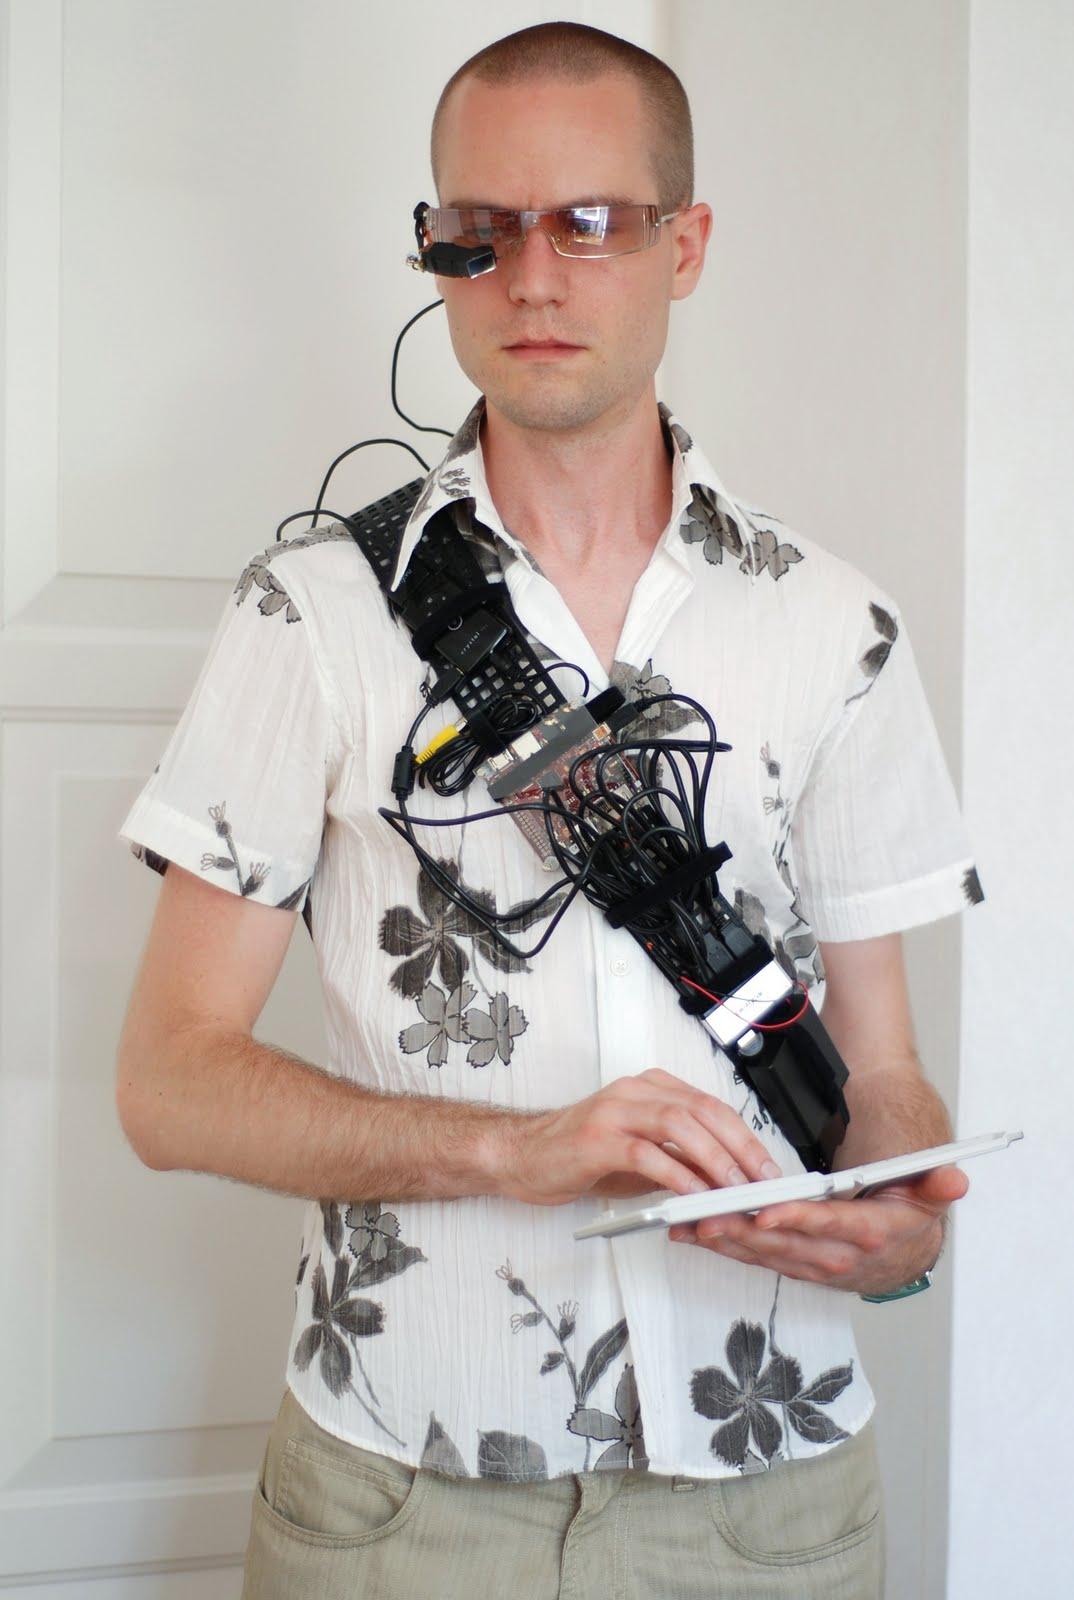 DIY wearable computer